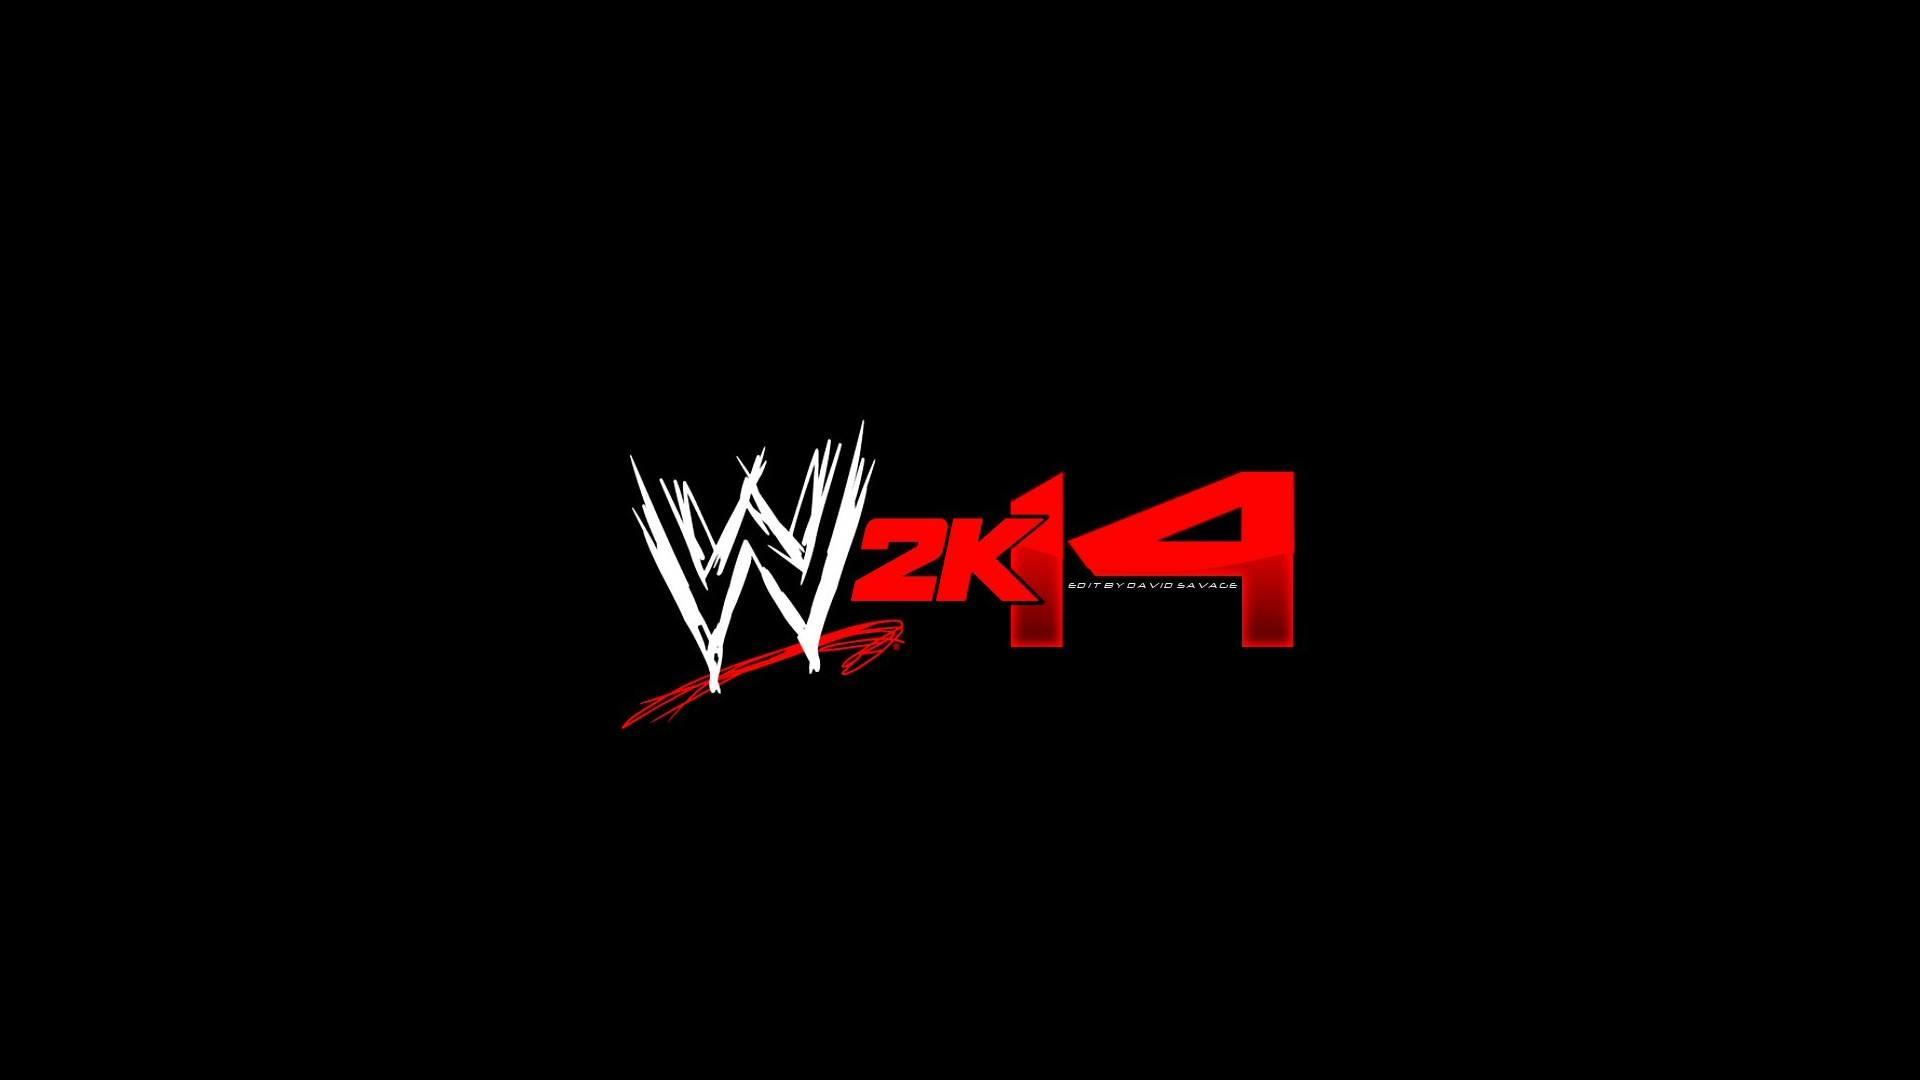 WWE Logo HD Wallpapers Download For PC Desktop